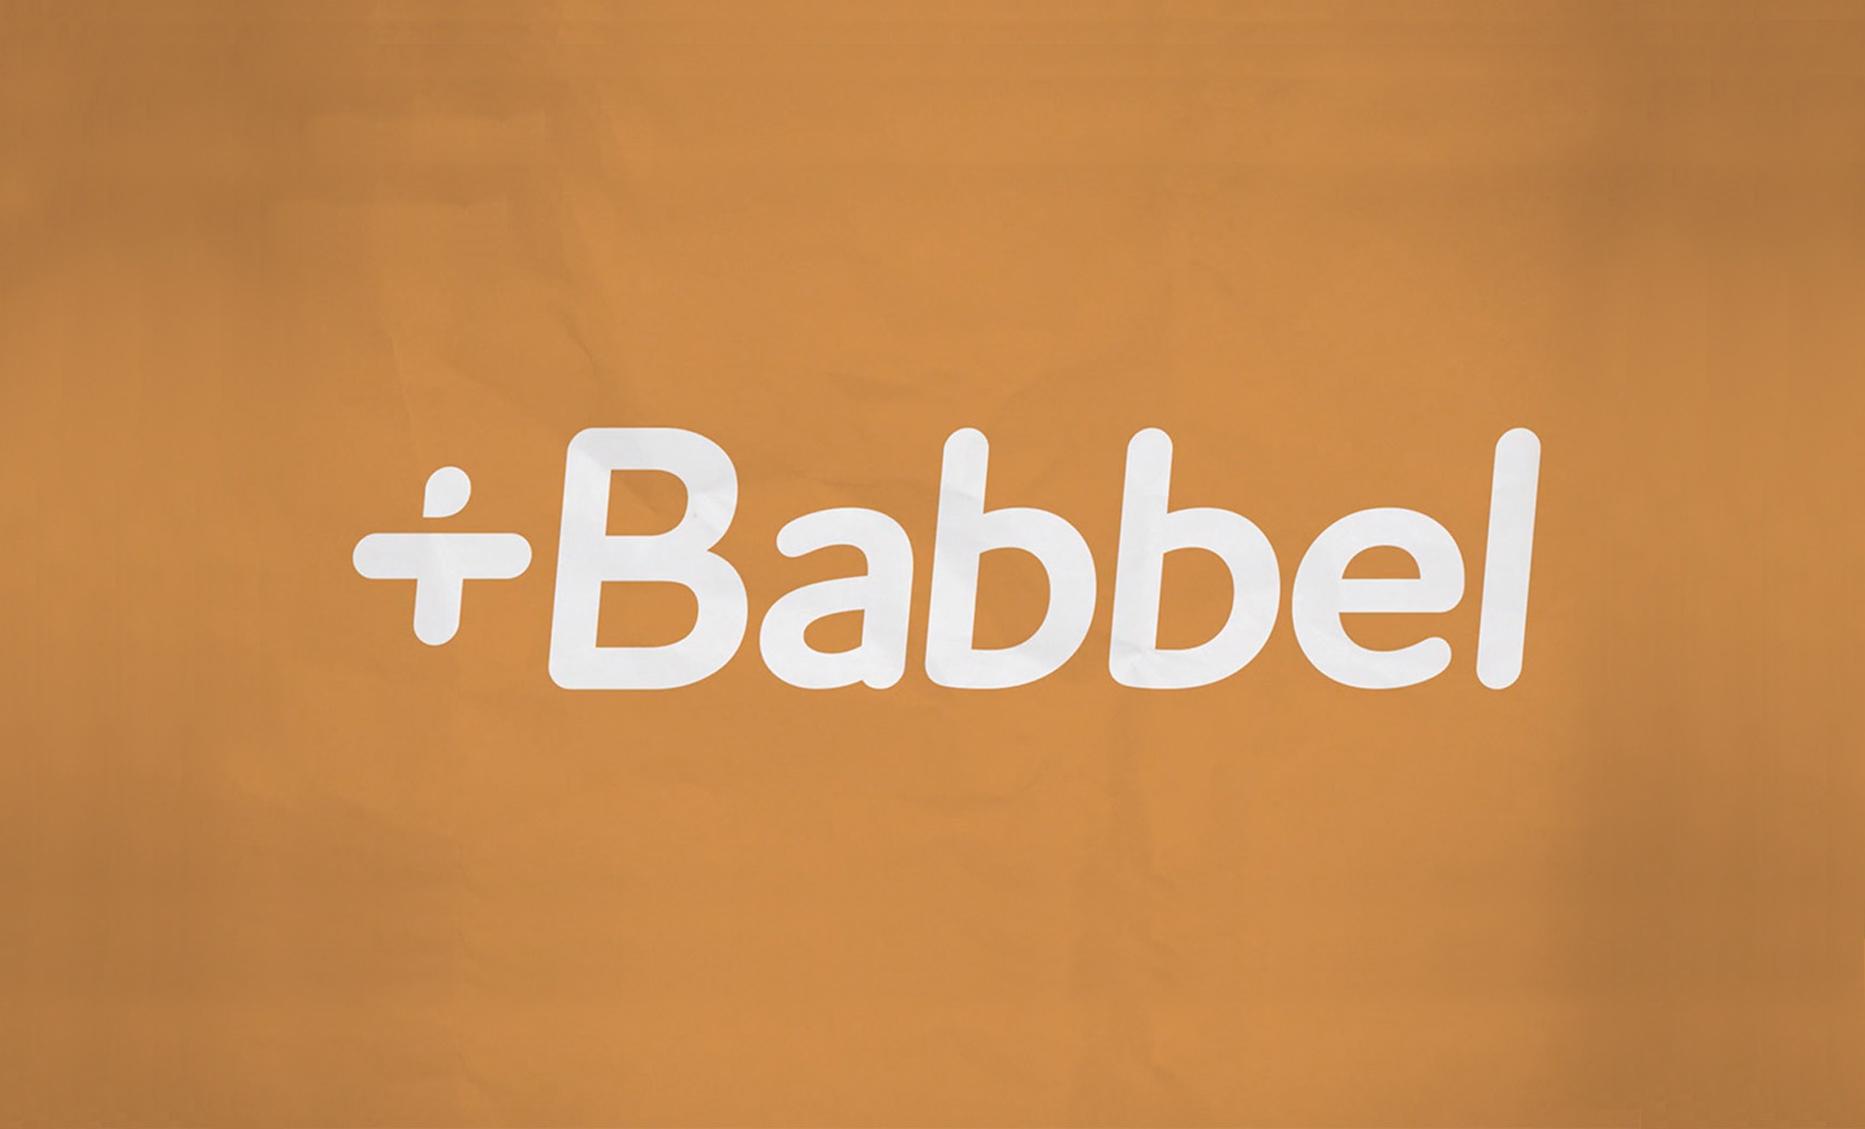 babbel_featuread.jpg